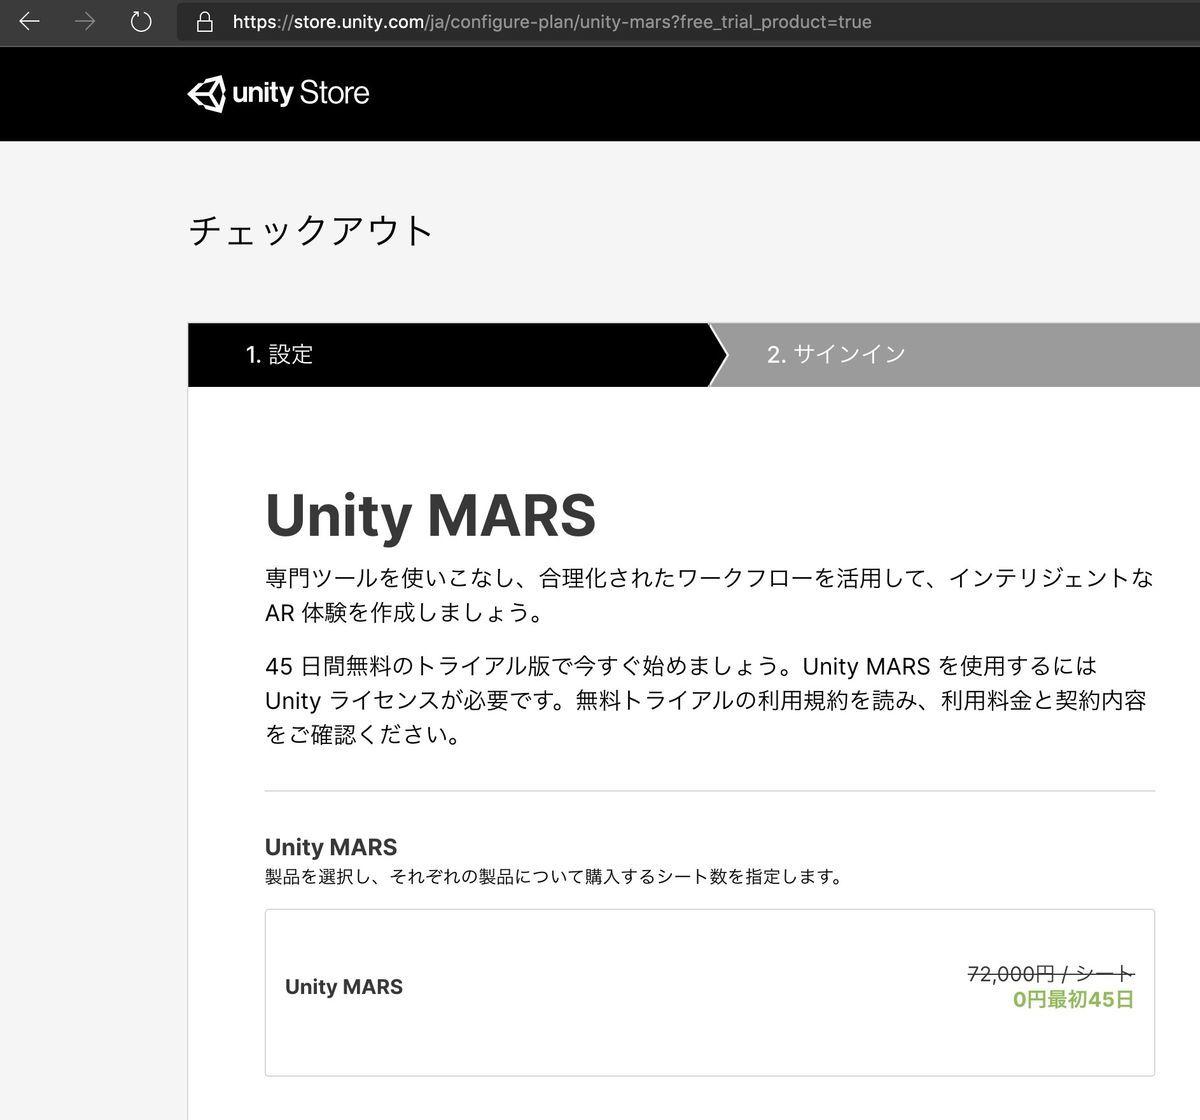 License fee of Unity MARS